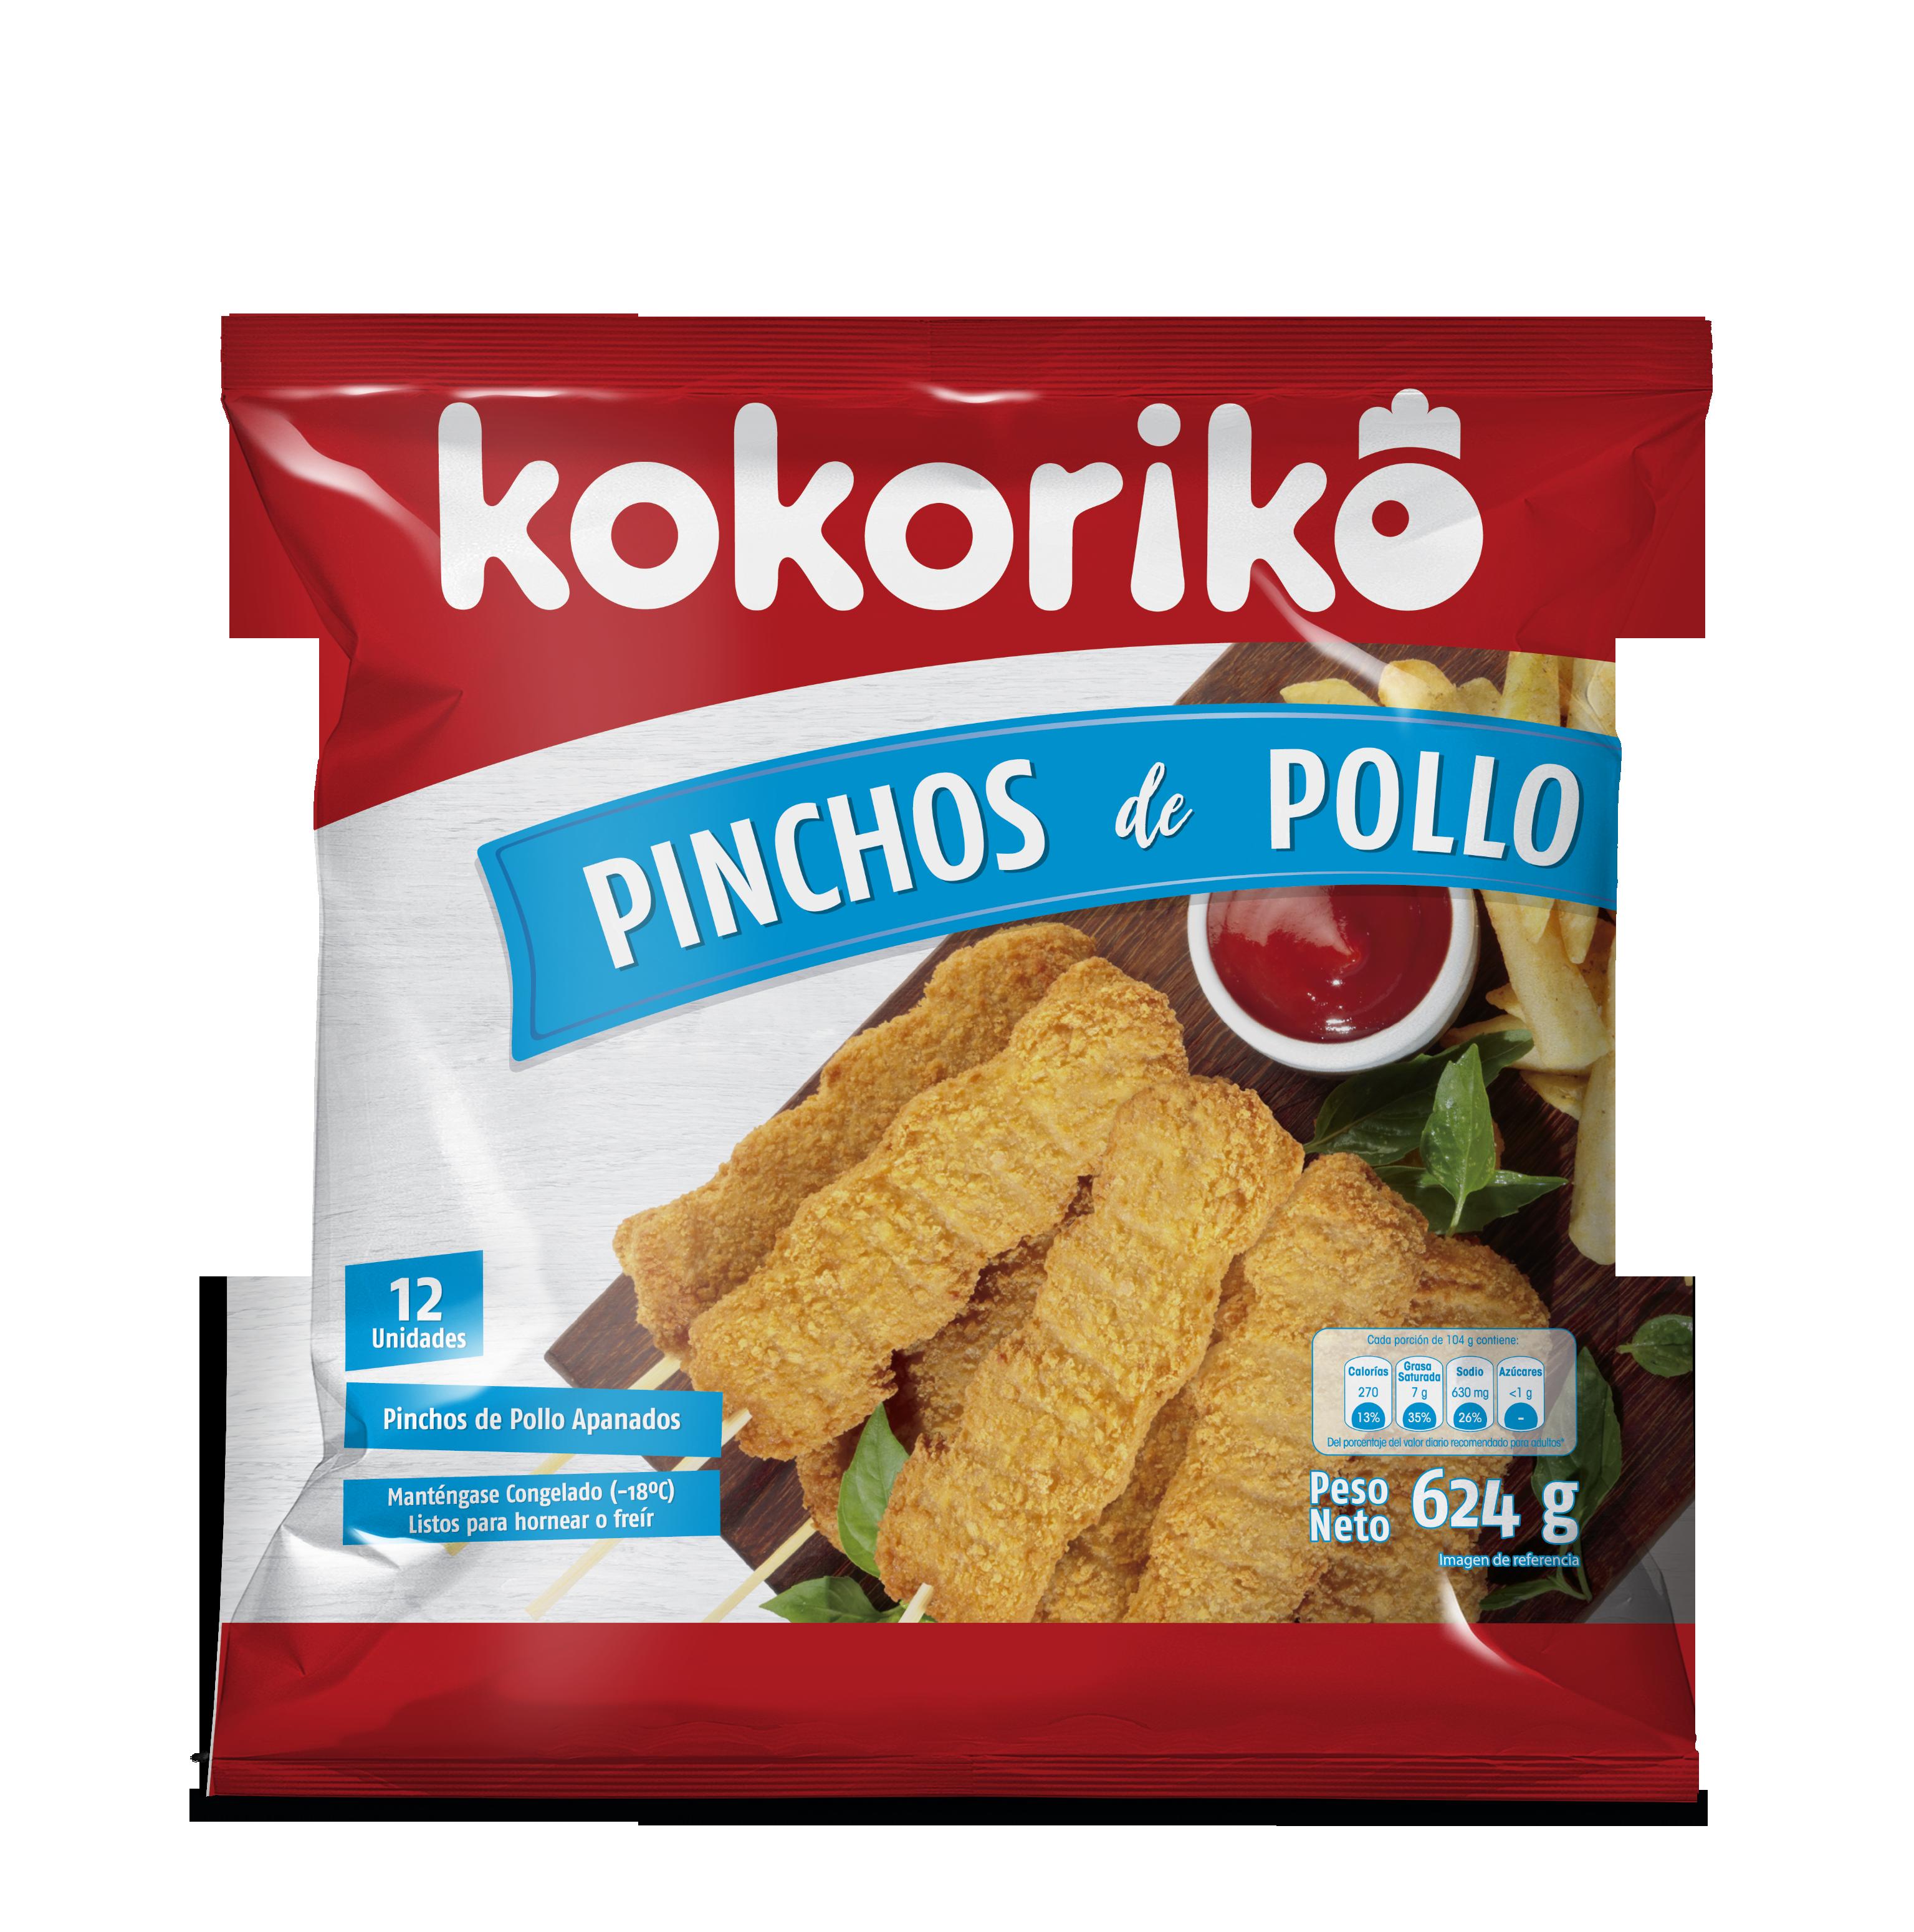 Pinchos Pollo Kokoriko 12u 624g